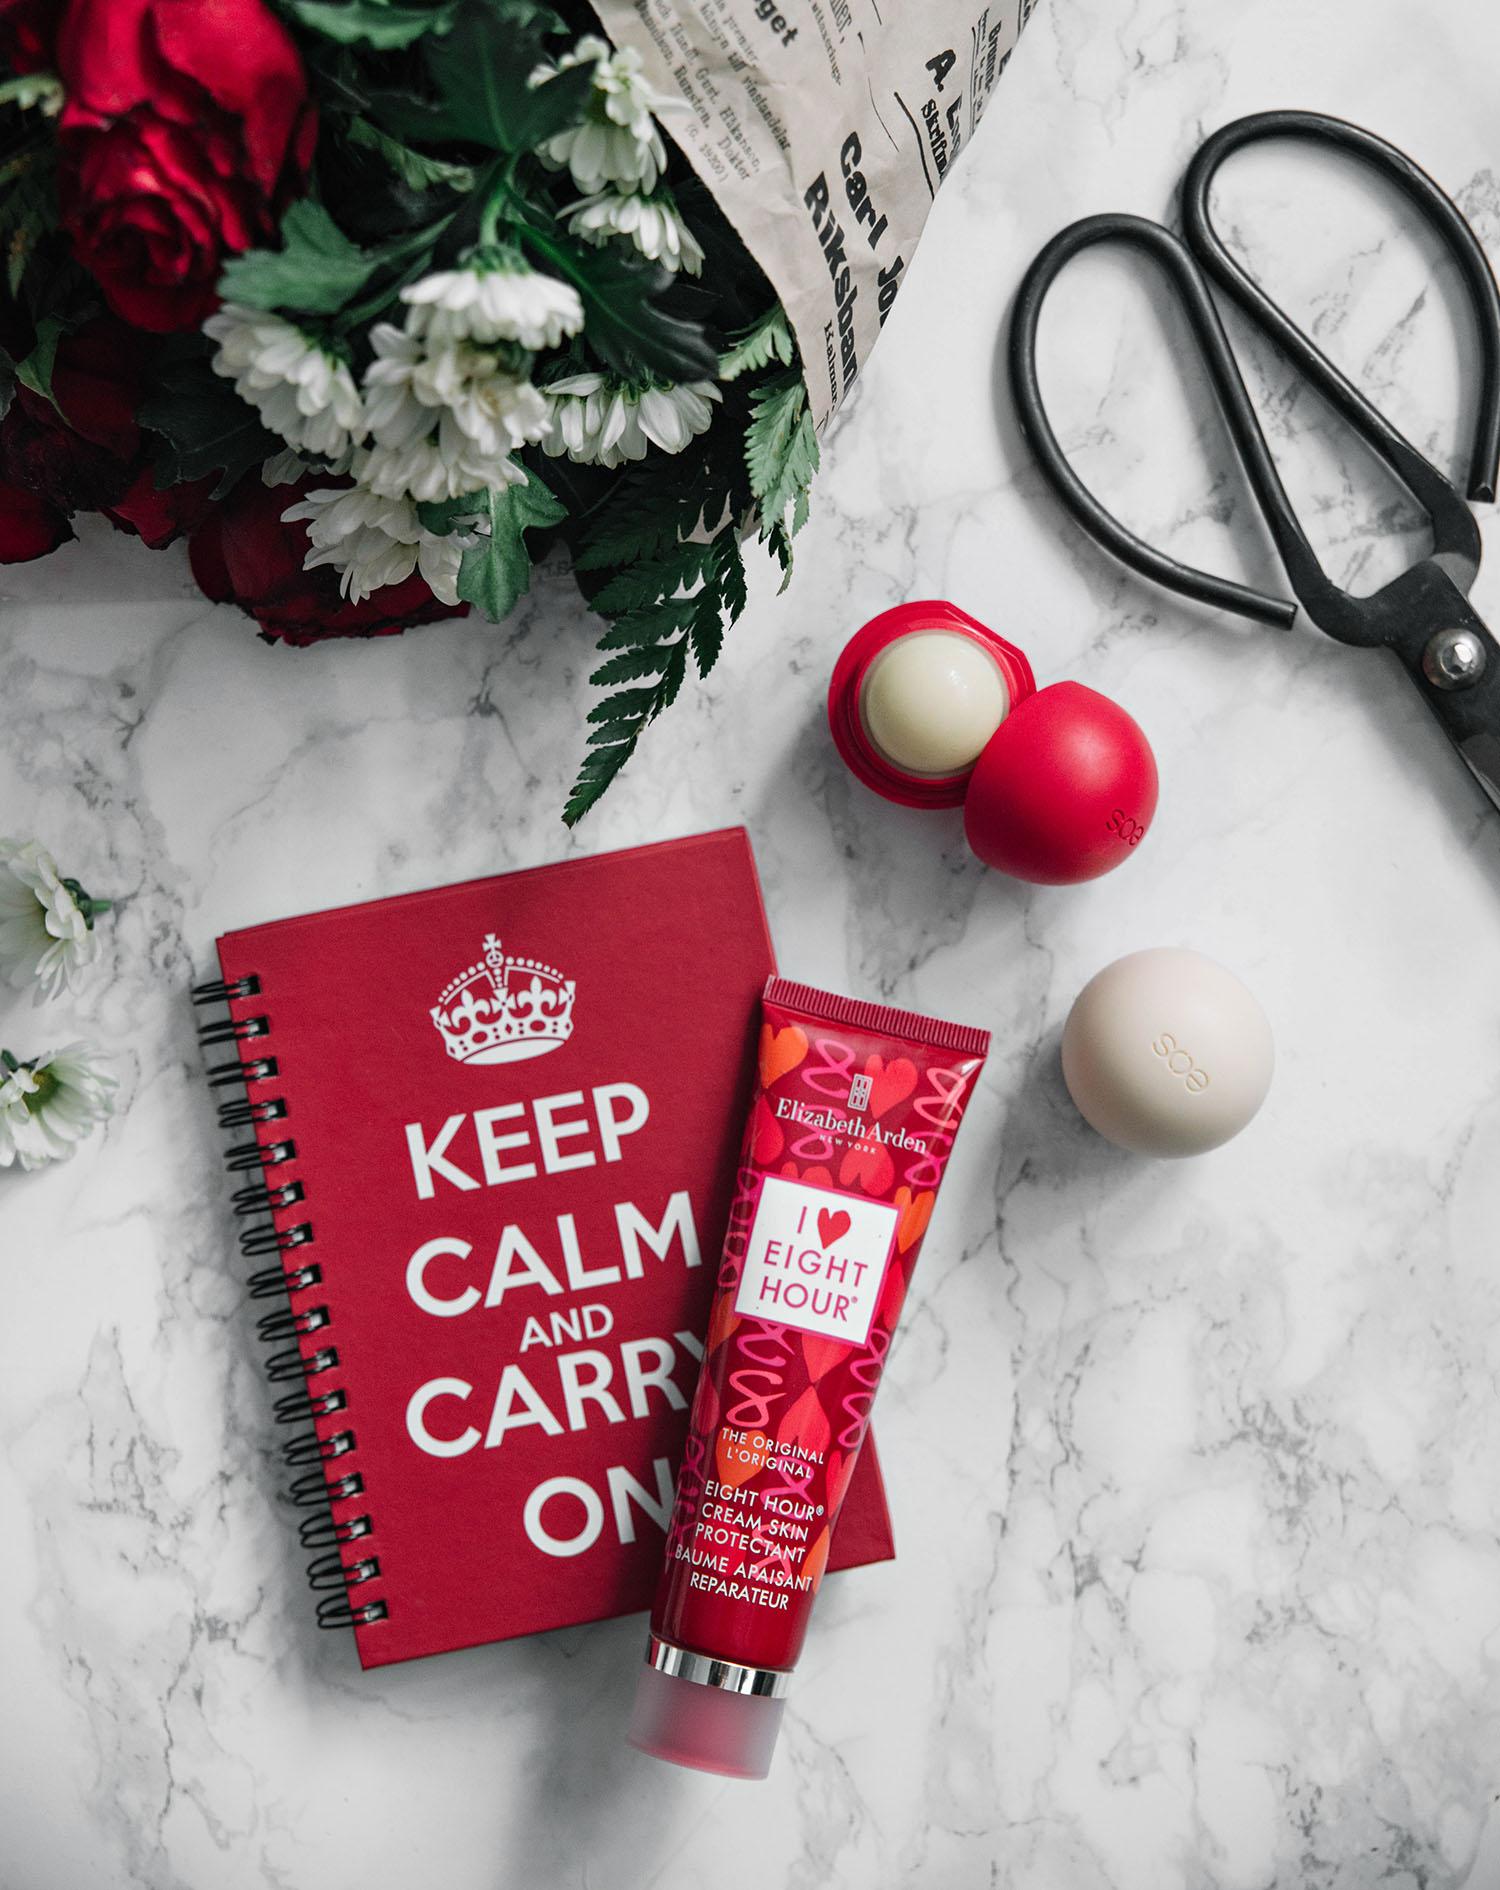 Flatlay with Elizabeth Arden Eight Hour Skin Protectant Cream & Eos, flower bouquet & old scissor